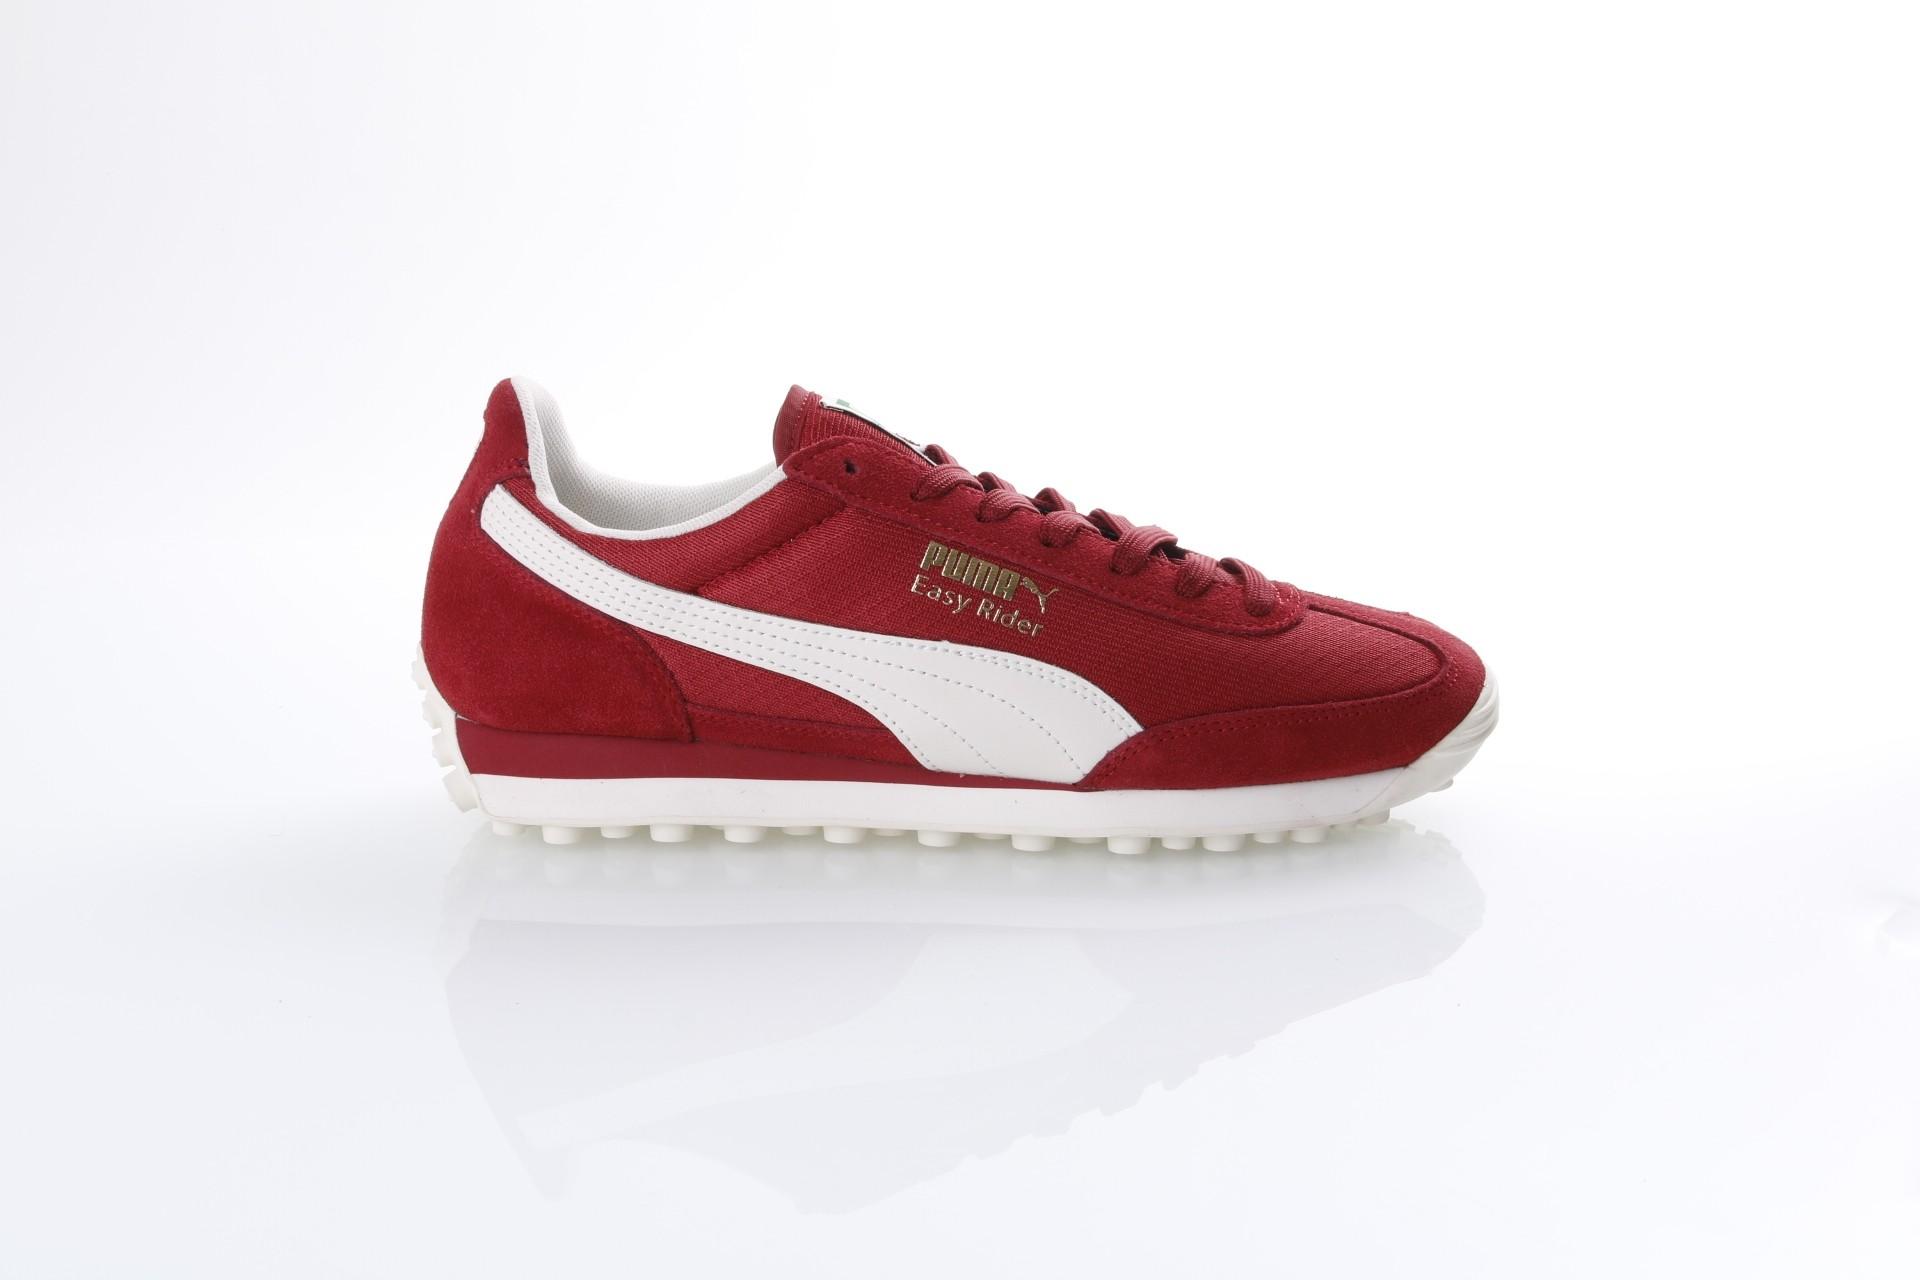 f5295c9b154 Puma Sneakers kopen? Shop je items bij Go Britain | Go-Britain.nl